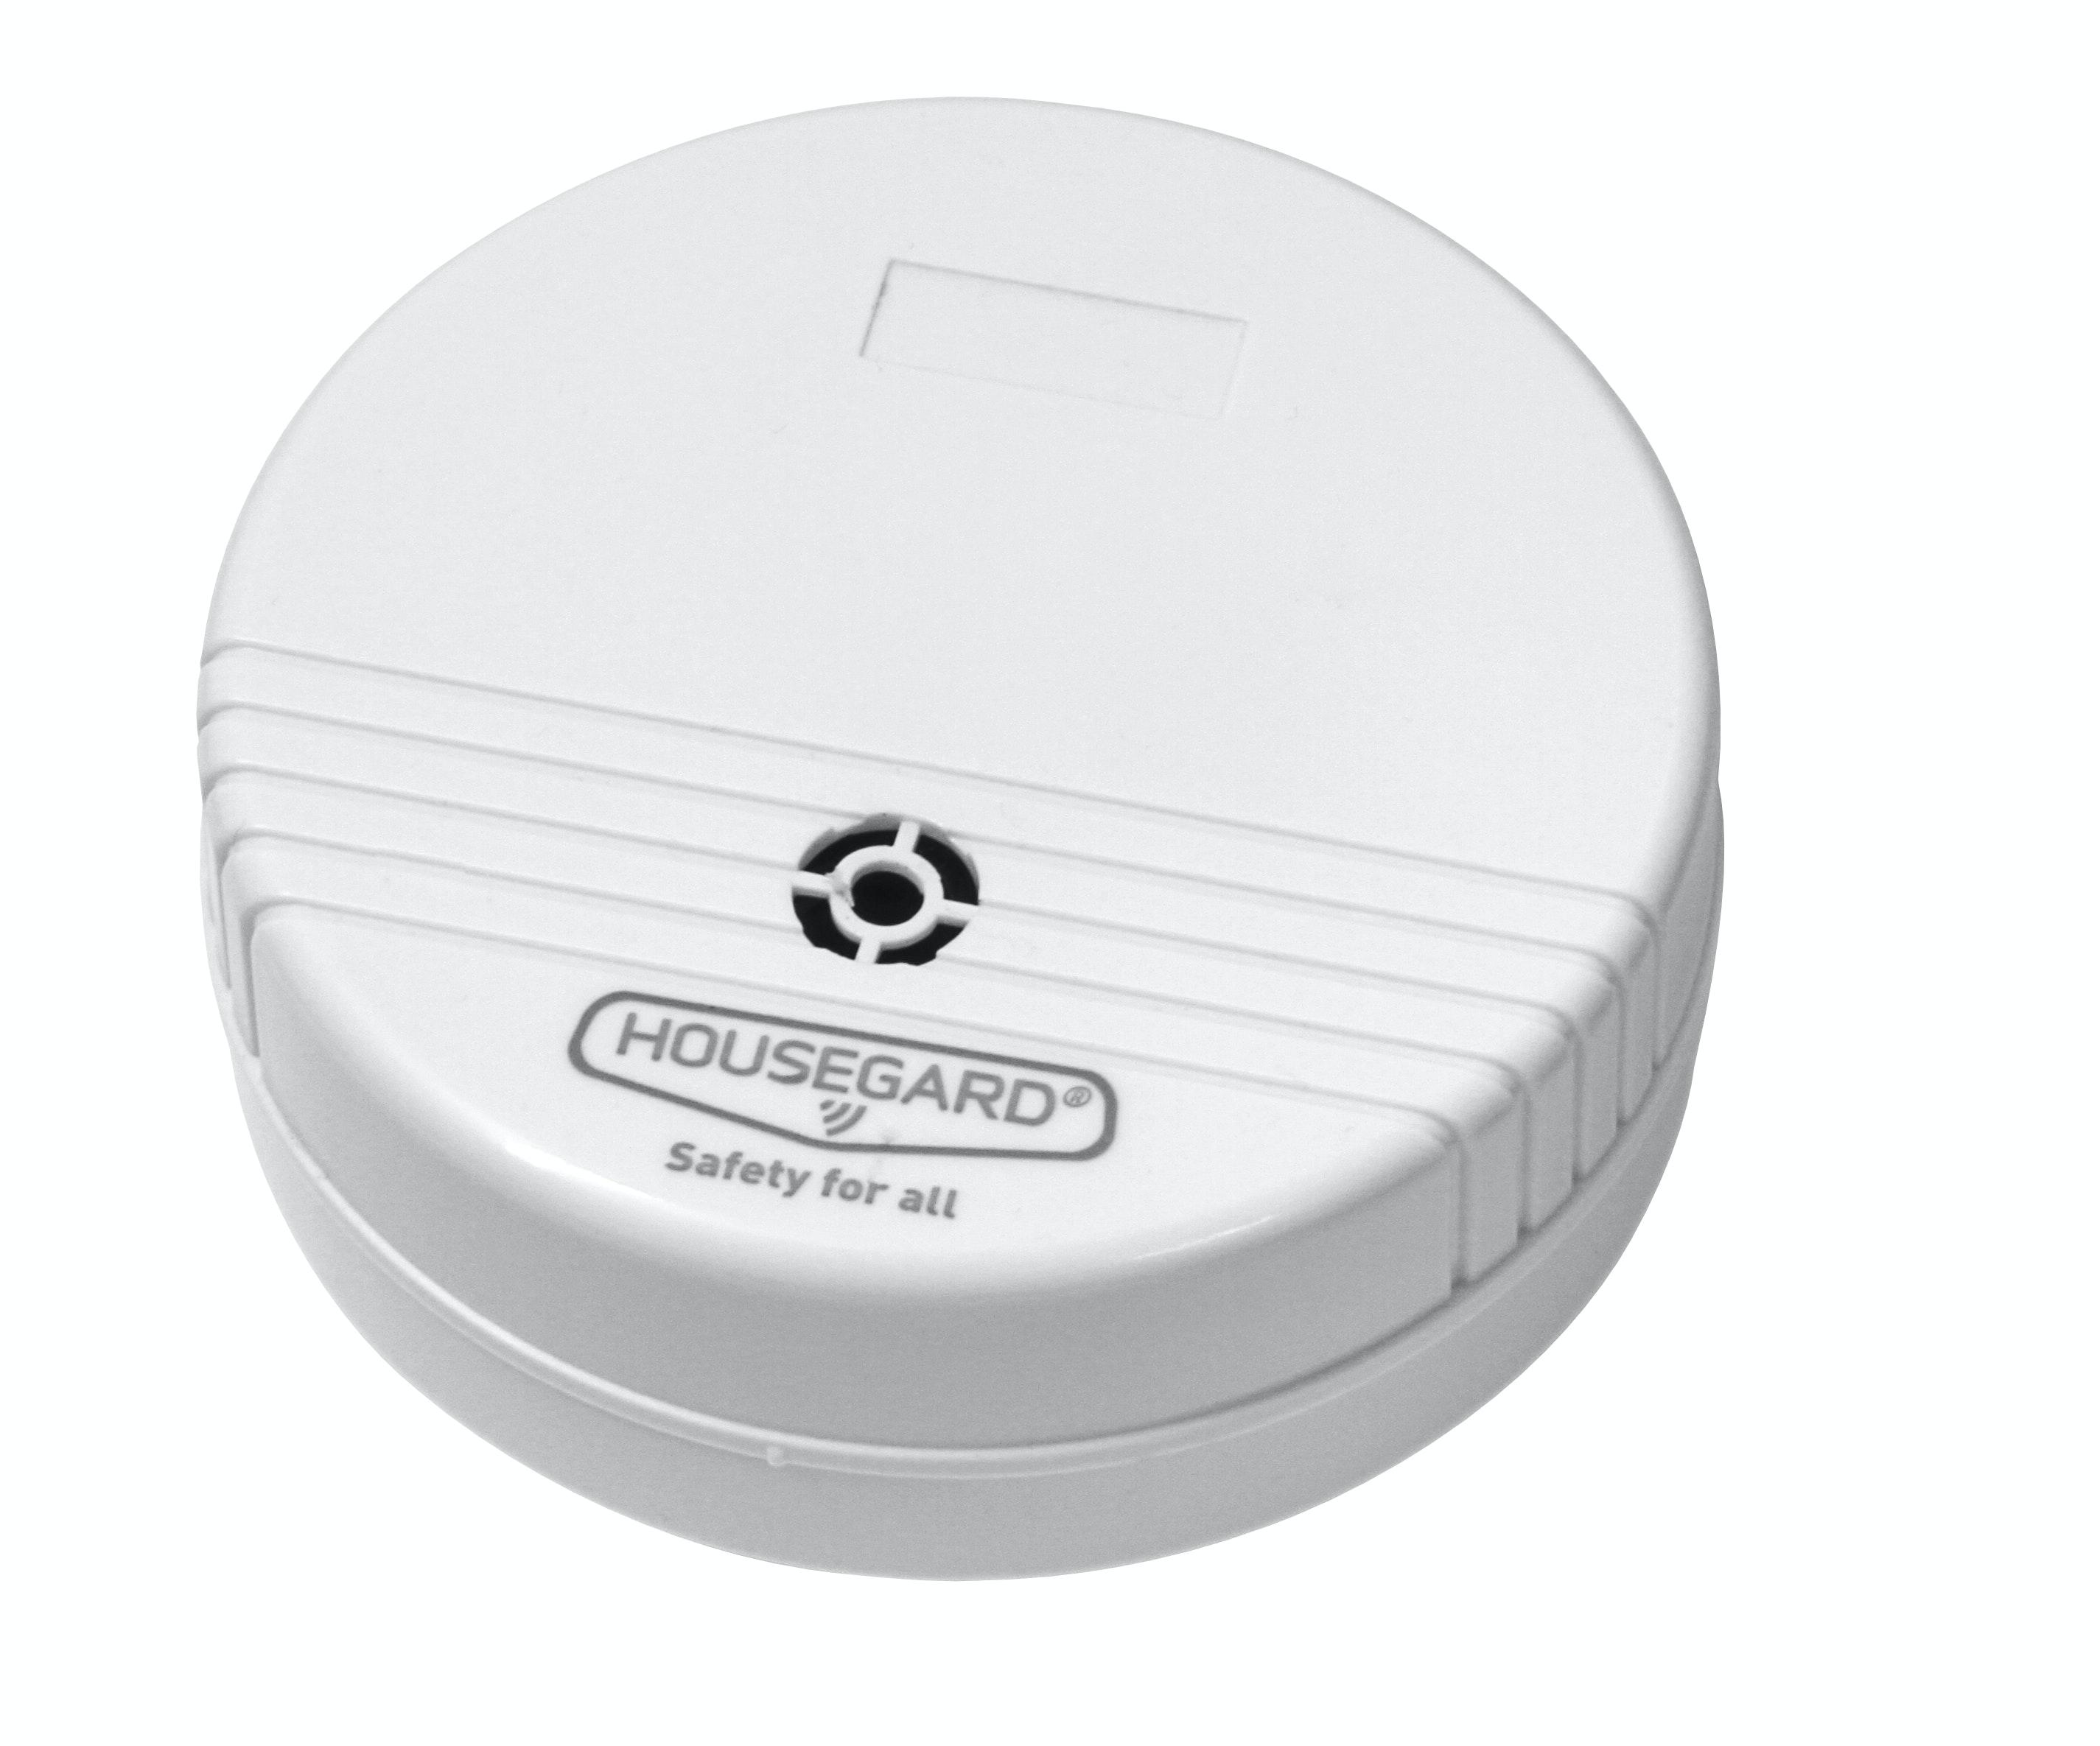 Vattenvarnare Housegard 9 Volt